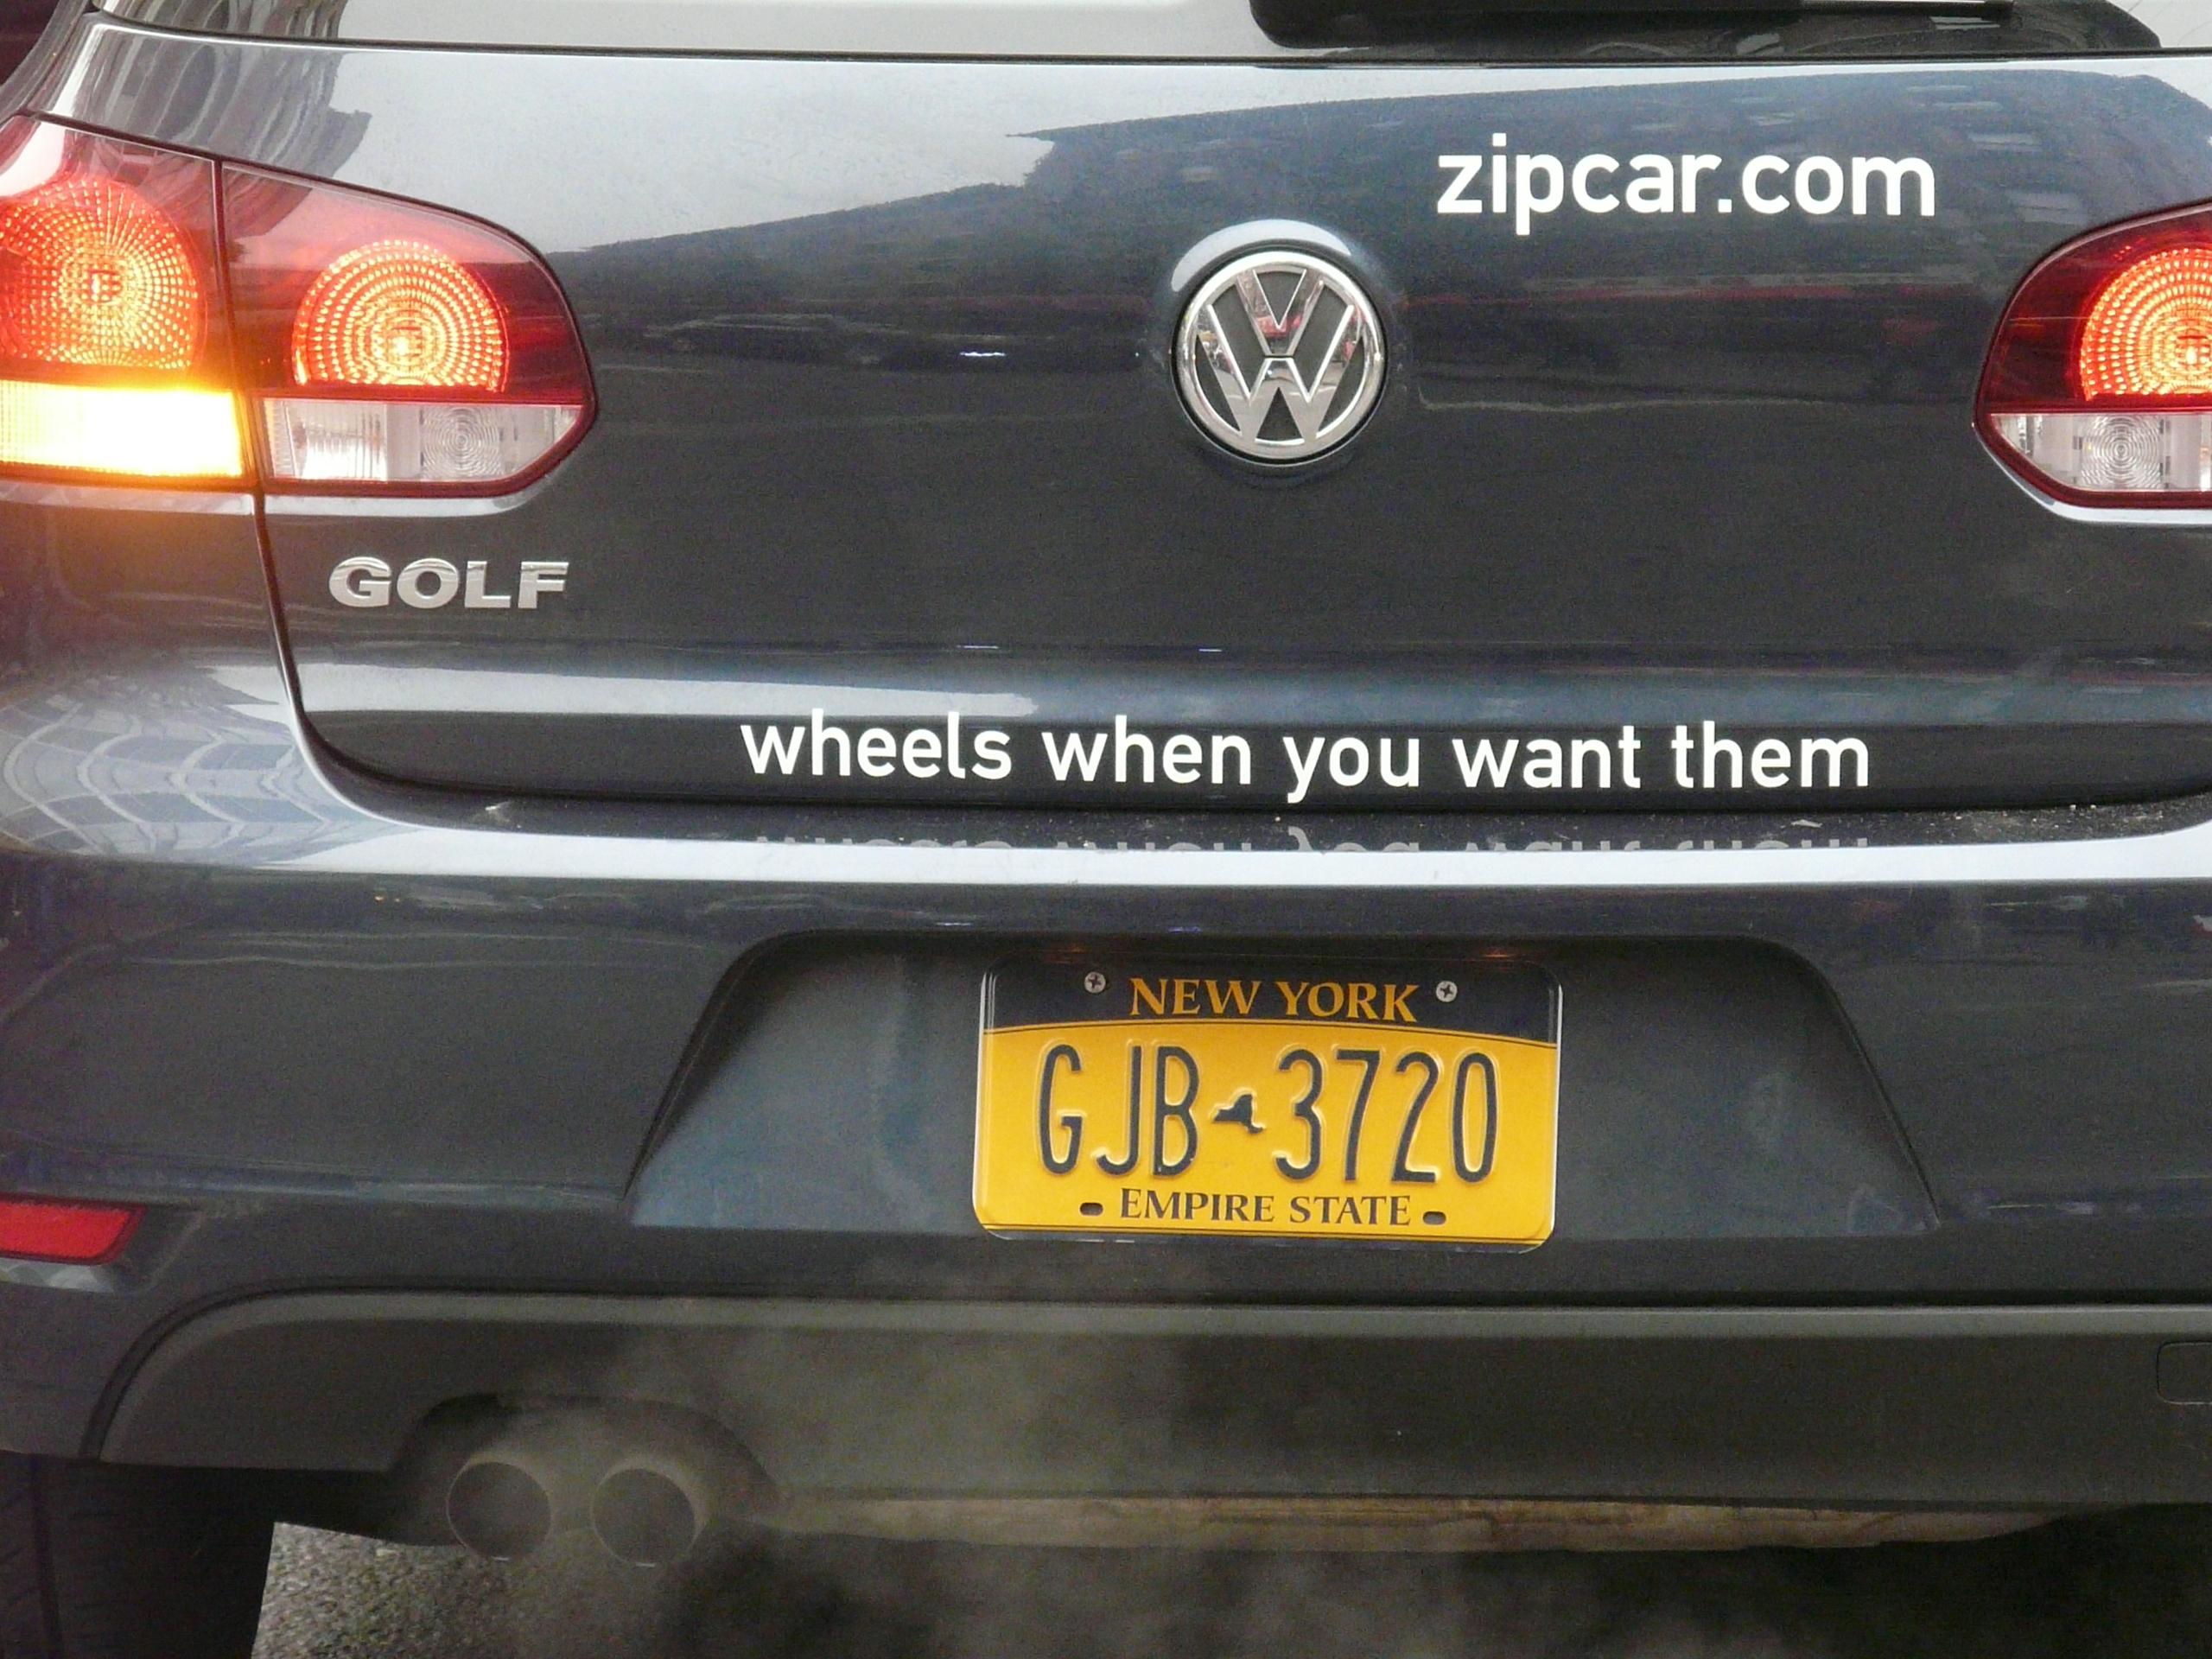 N.Y. zipcar